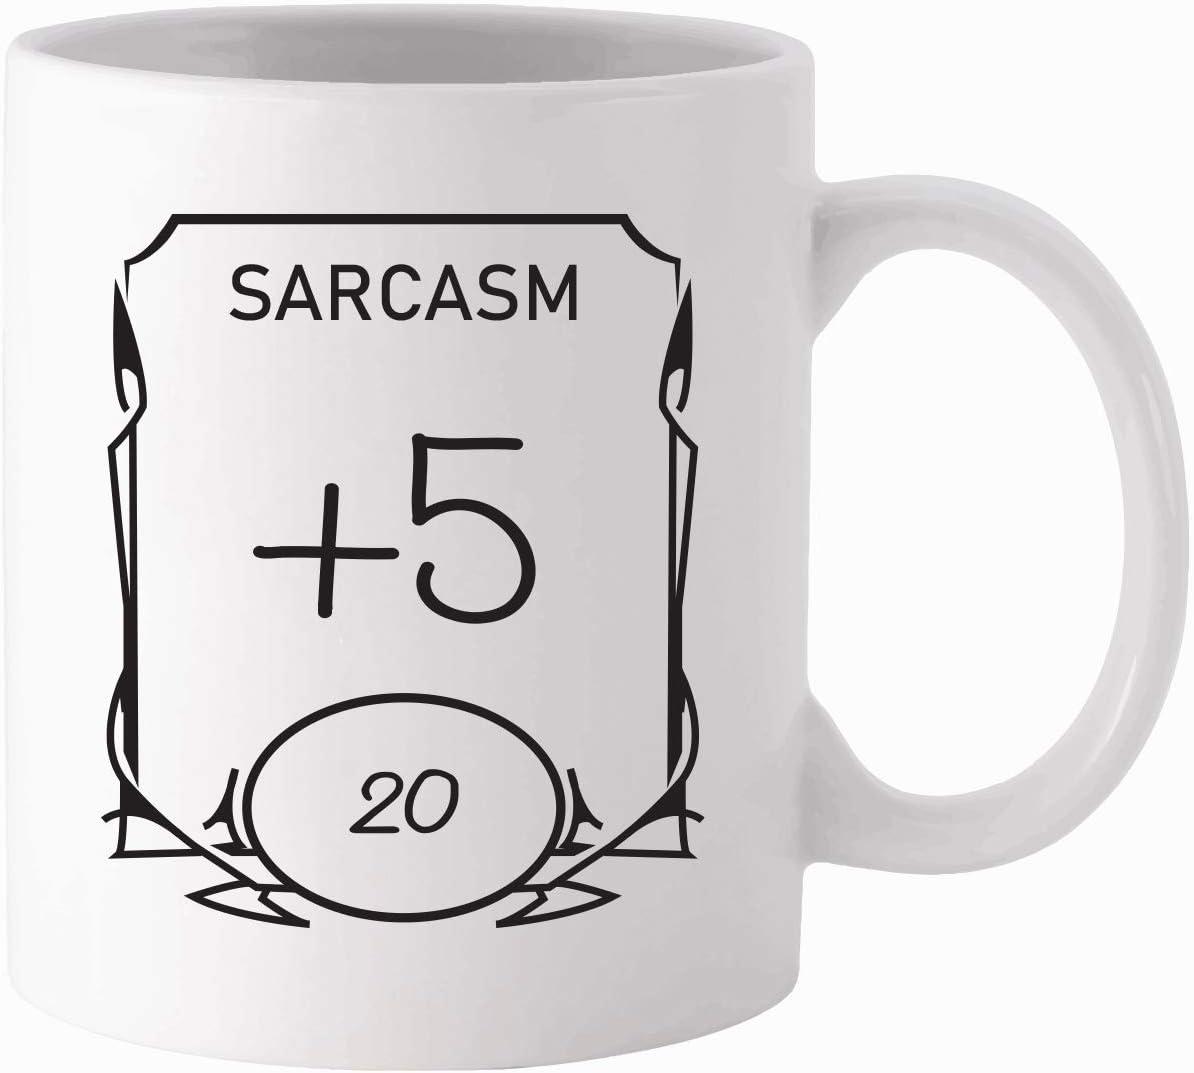 D&D Stats Mug - Sarcasm 11oz White Ceramic Coffee Mug - Dungeons and Dragons - RPG - DnD - Gift for Geeks